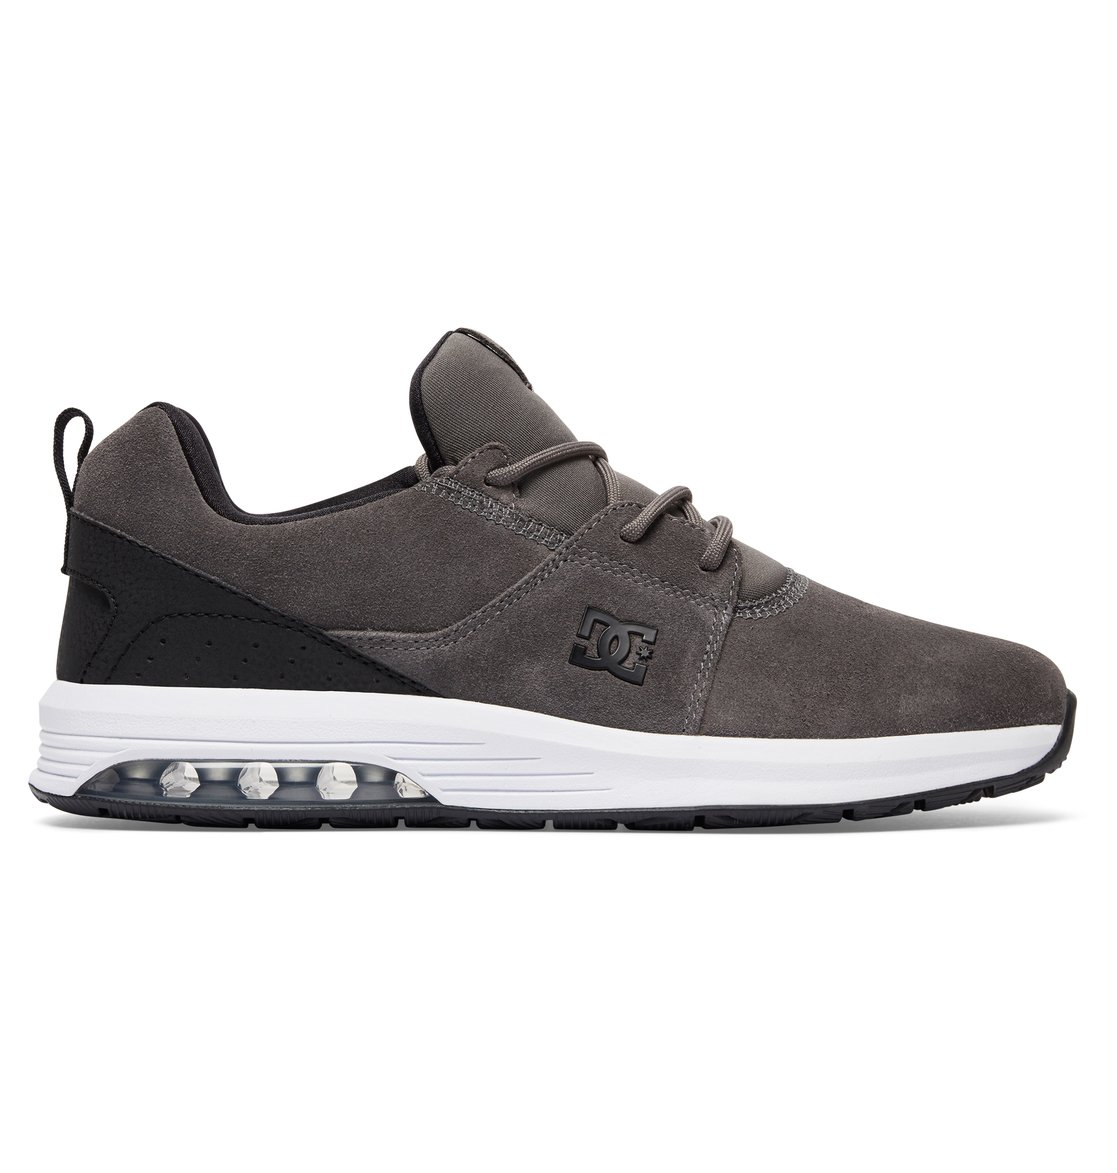 dc shoes men 39 s heathrow ia shoes adys200035 ebay. Black Bedroom Furniture Sets. Home Design Ideas